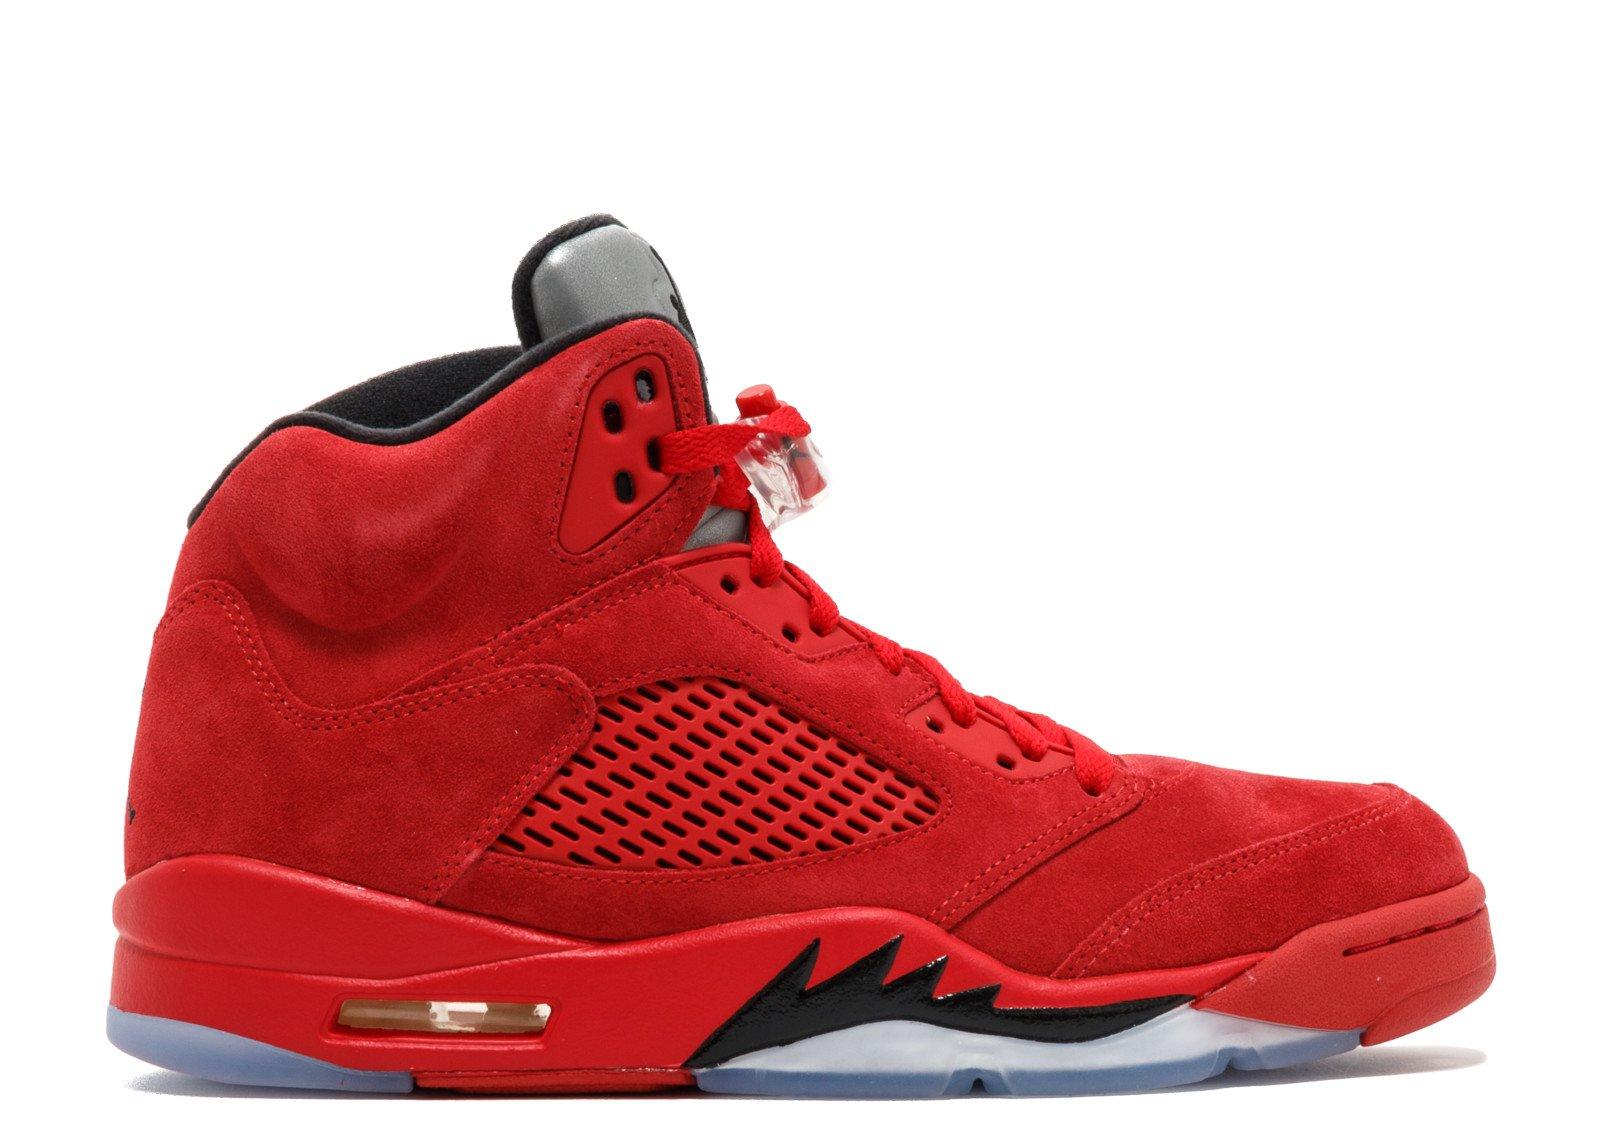 "Air Jordan 5 Retro ""red Suede"" - Air Jordan - 136027 602 - university red/black | Flight Club"